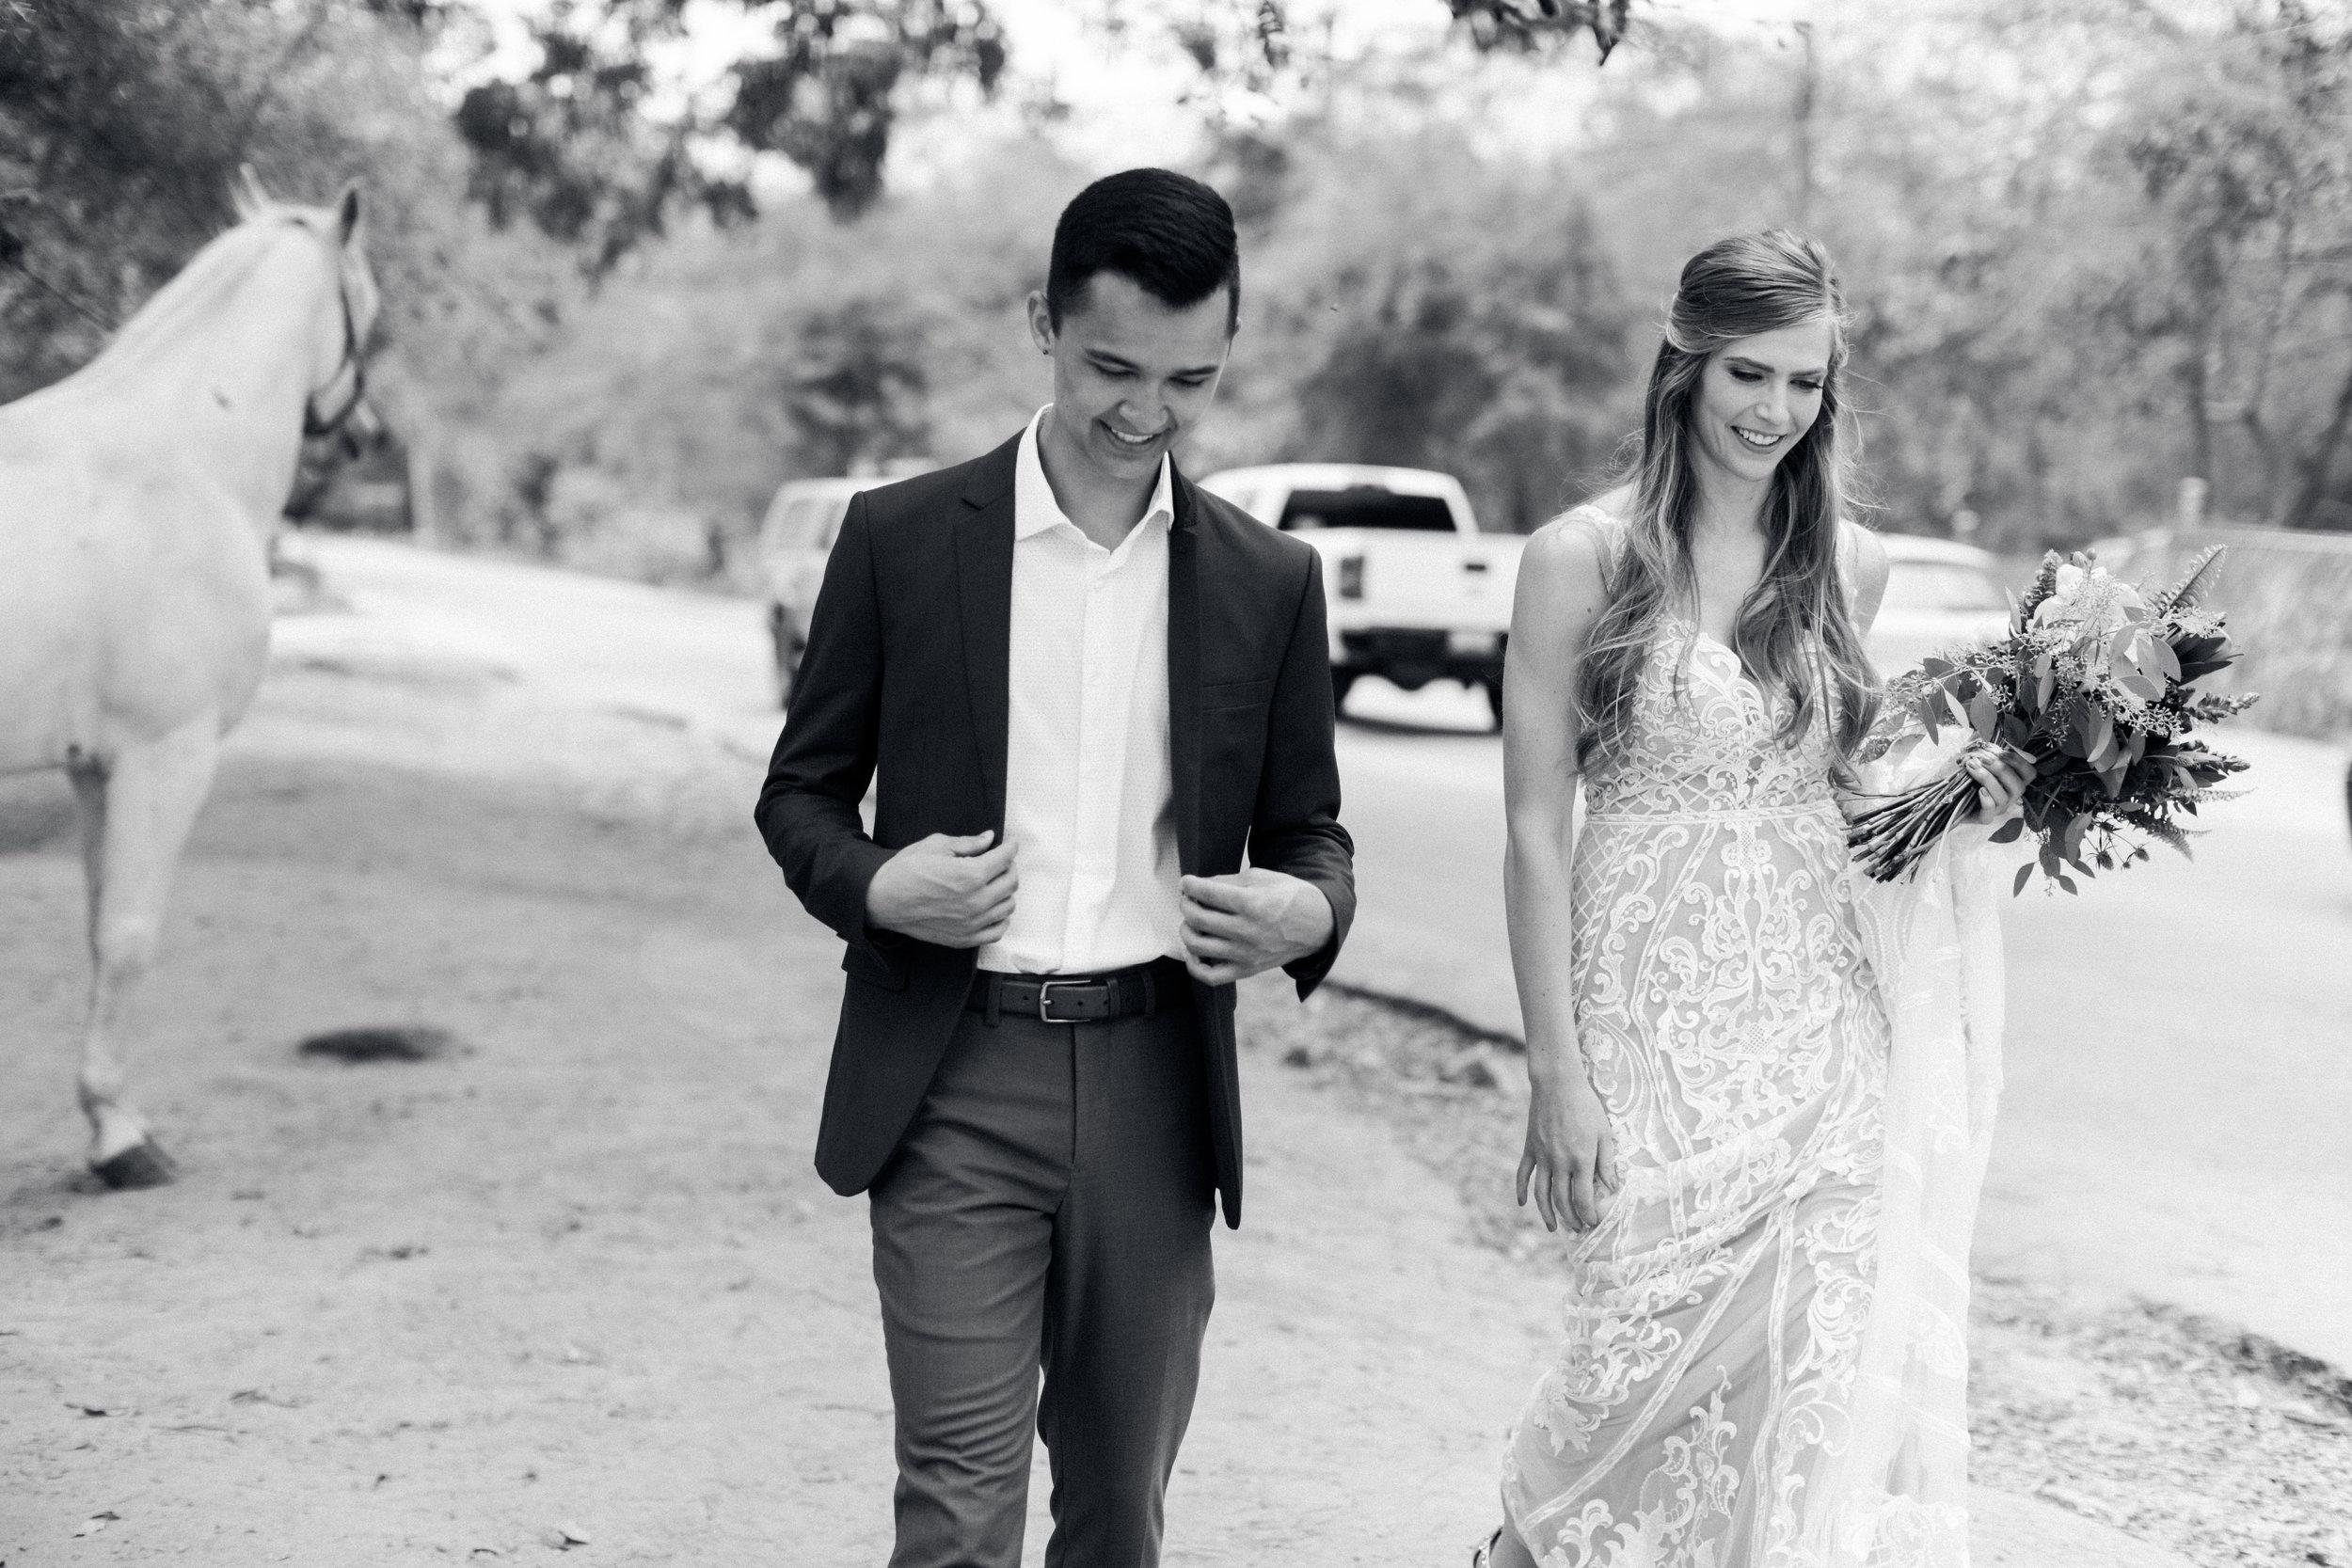 Ryan-Hannah-Sayulita-Mexico-Wedding-Alycia-Lovell-Photography-172.JPG